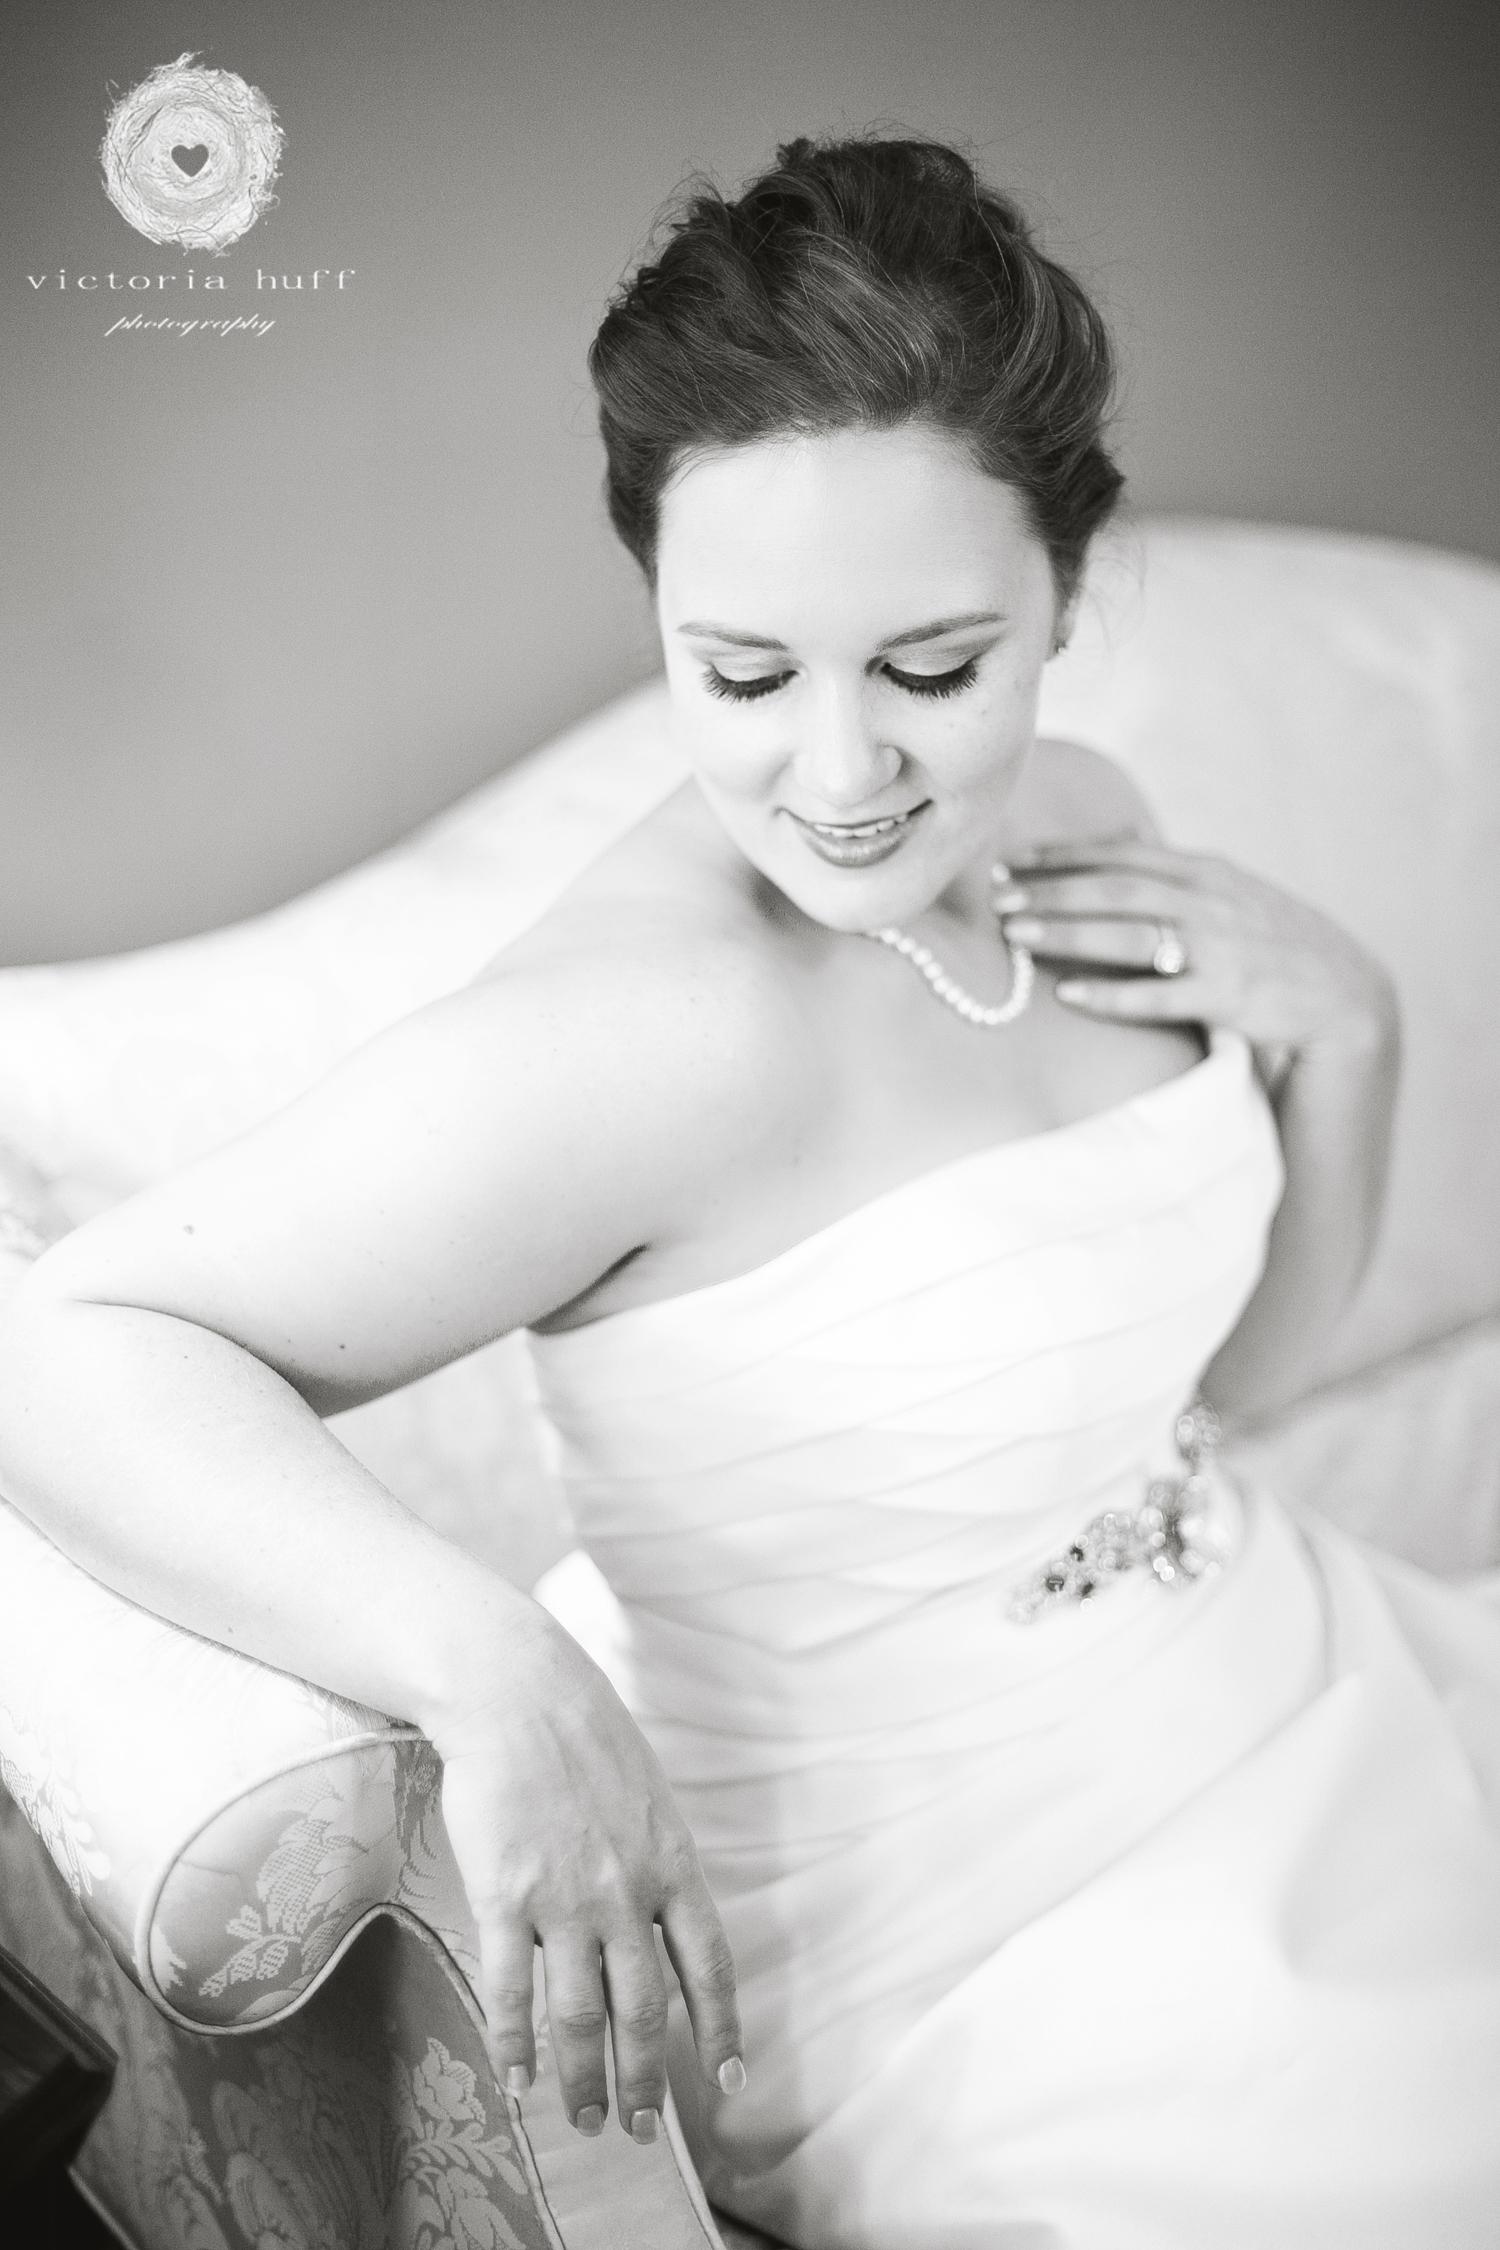 Wedding-Photography-Emily-Phillips-The-Corry-House-Union-Point-Georgia-Vintage-Wedding-3.jpg